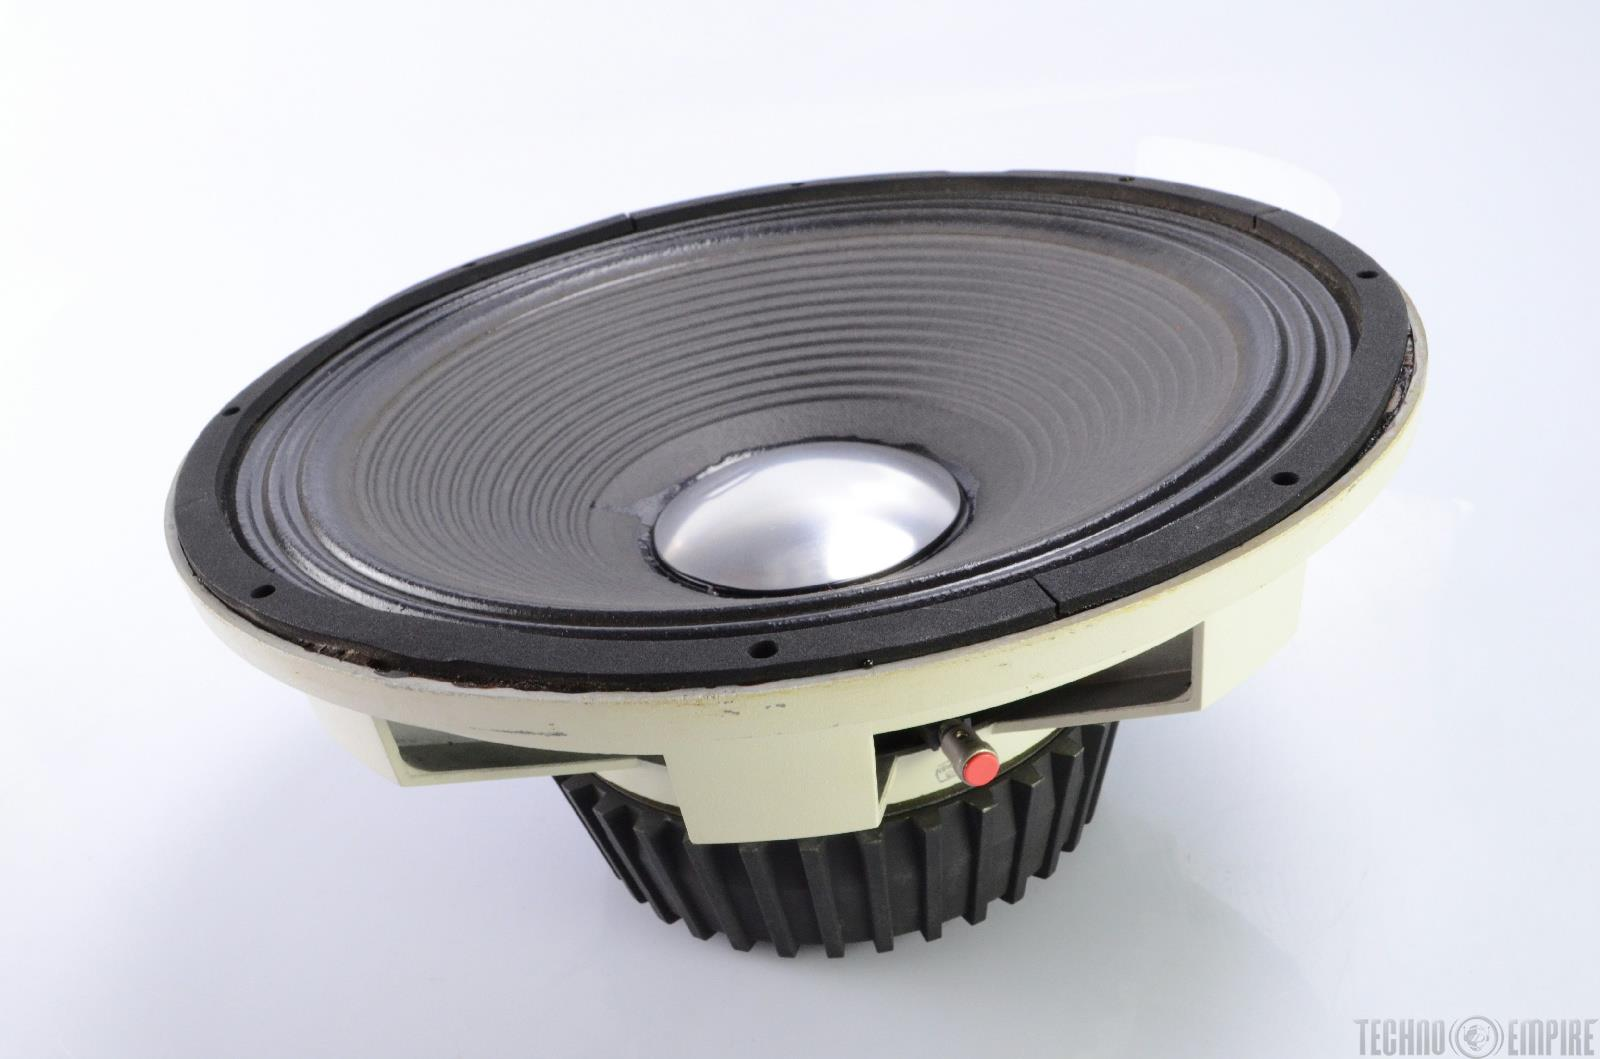 cetec gauss 4580 15 8 ohm 400 watt speakers pa bass amp. Black Bedroom Furniture Sets. Home Design Ideas